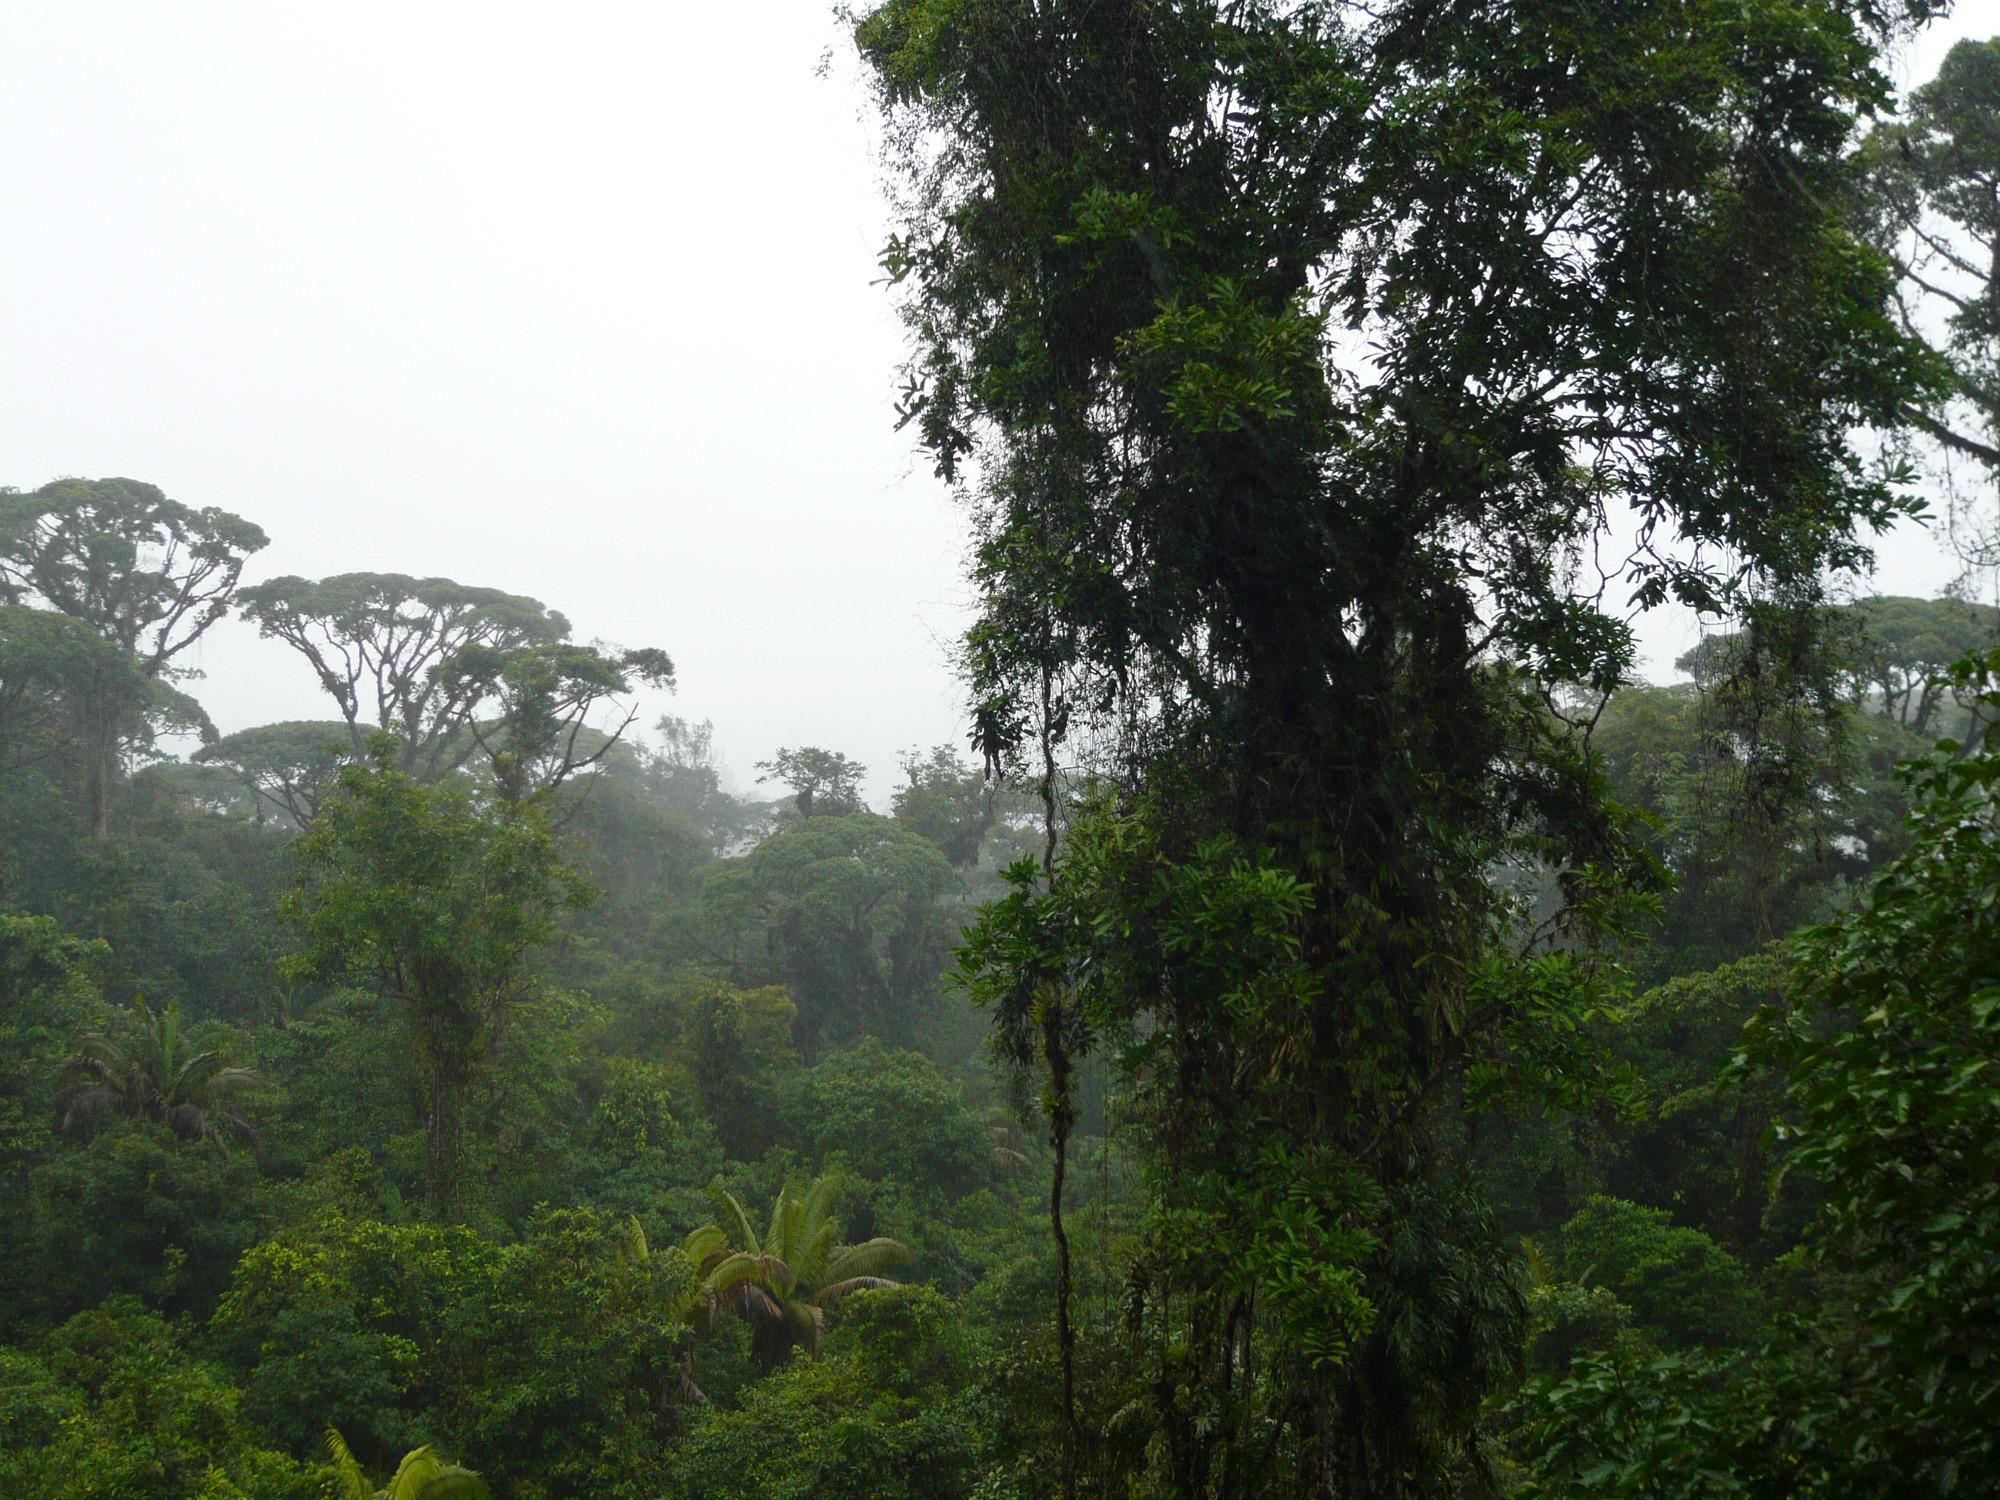 forêts de nuages forêt de nuage costa rica voyage braulio carrillo